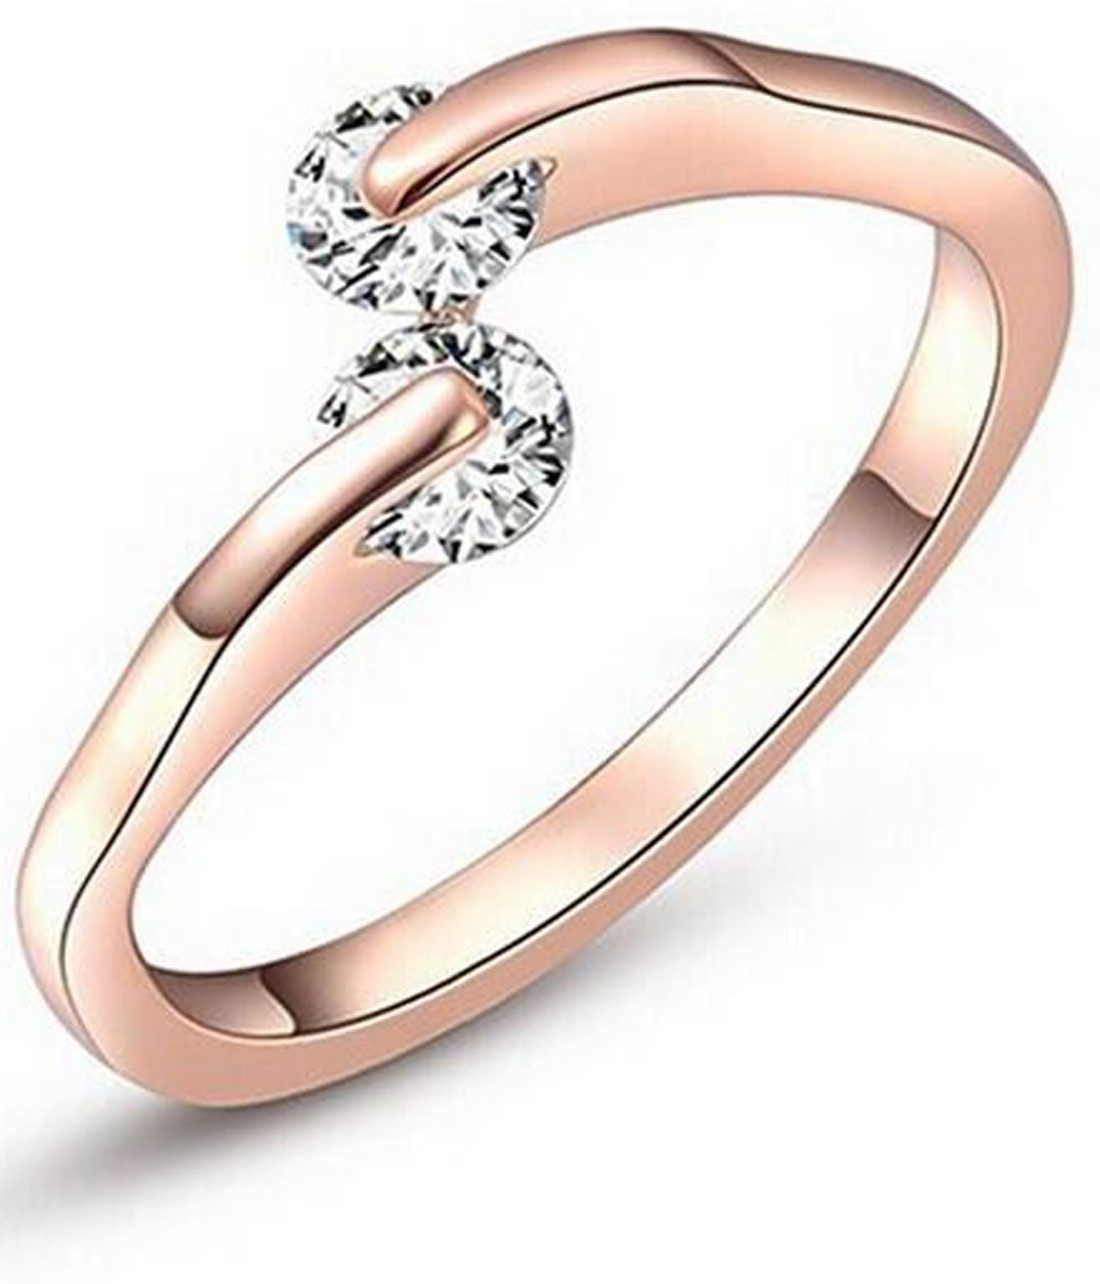 Deals - Delhi - Rings <br> Sukkhi, VK Jewels...<br> Category - jewellery<br> Business - Flipkart.com